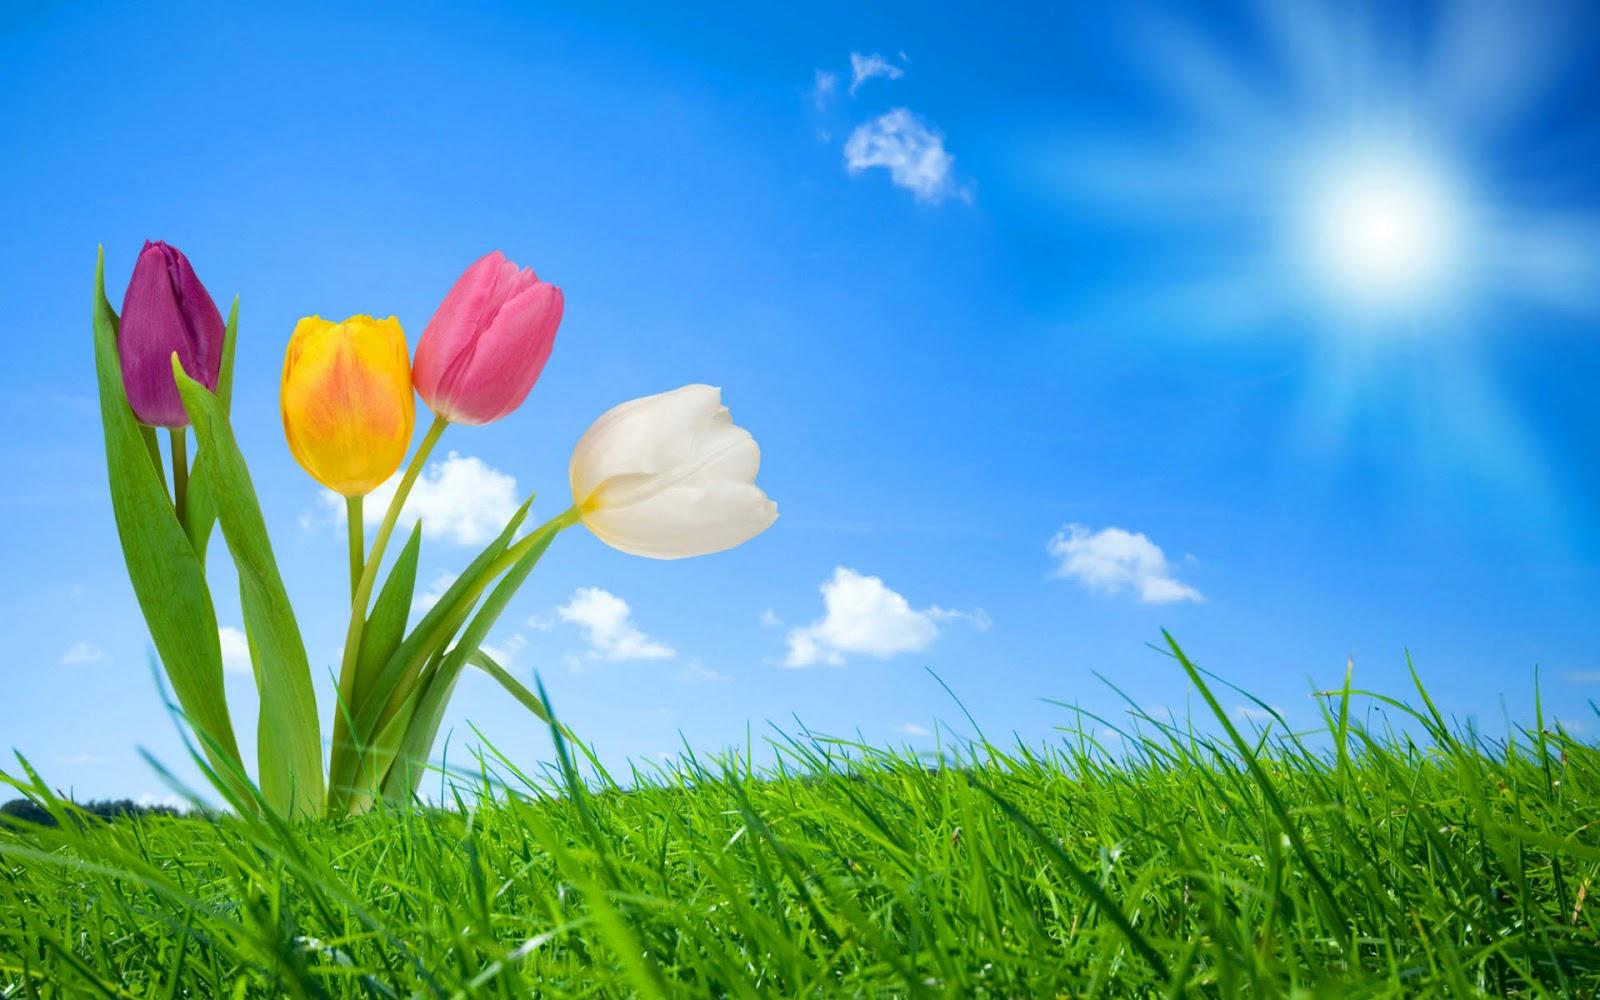 beautiful hd wallpapers amazing spring bliss desktop